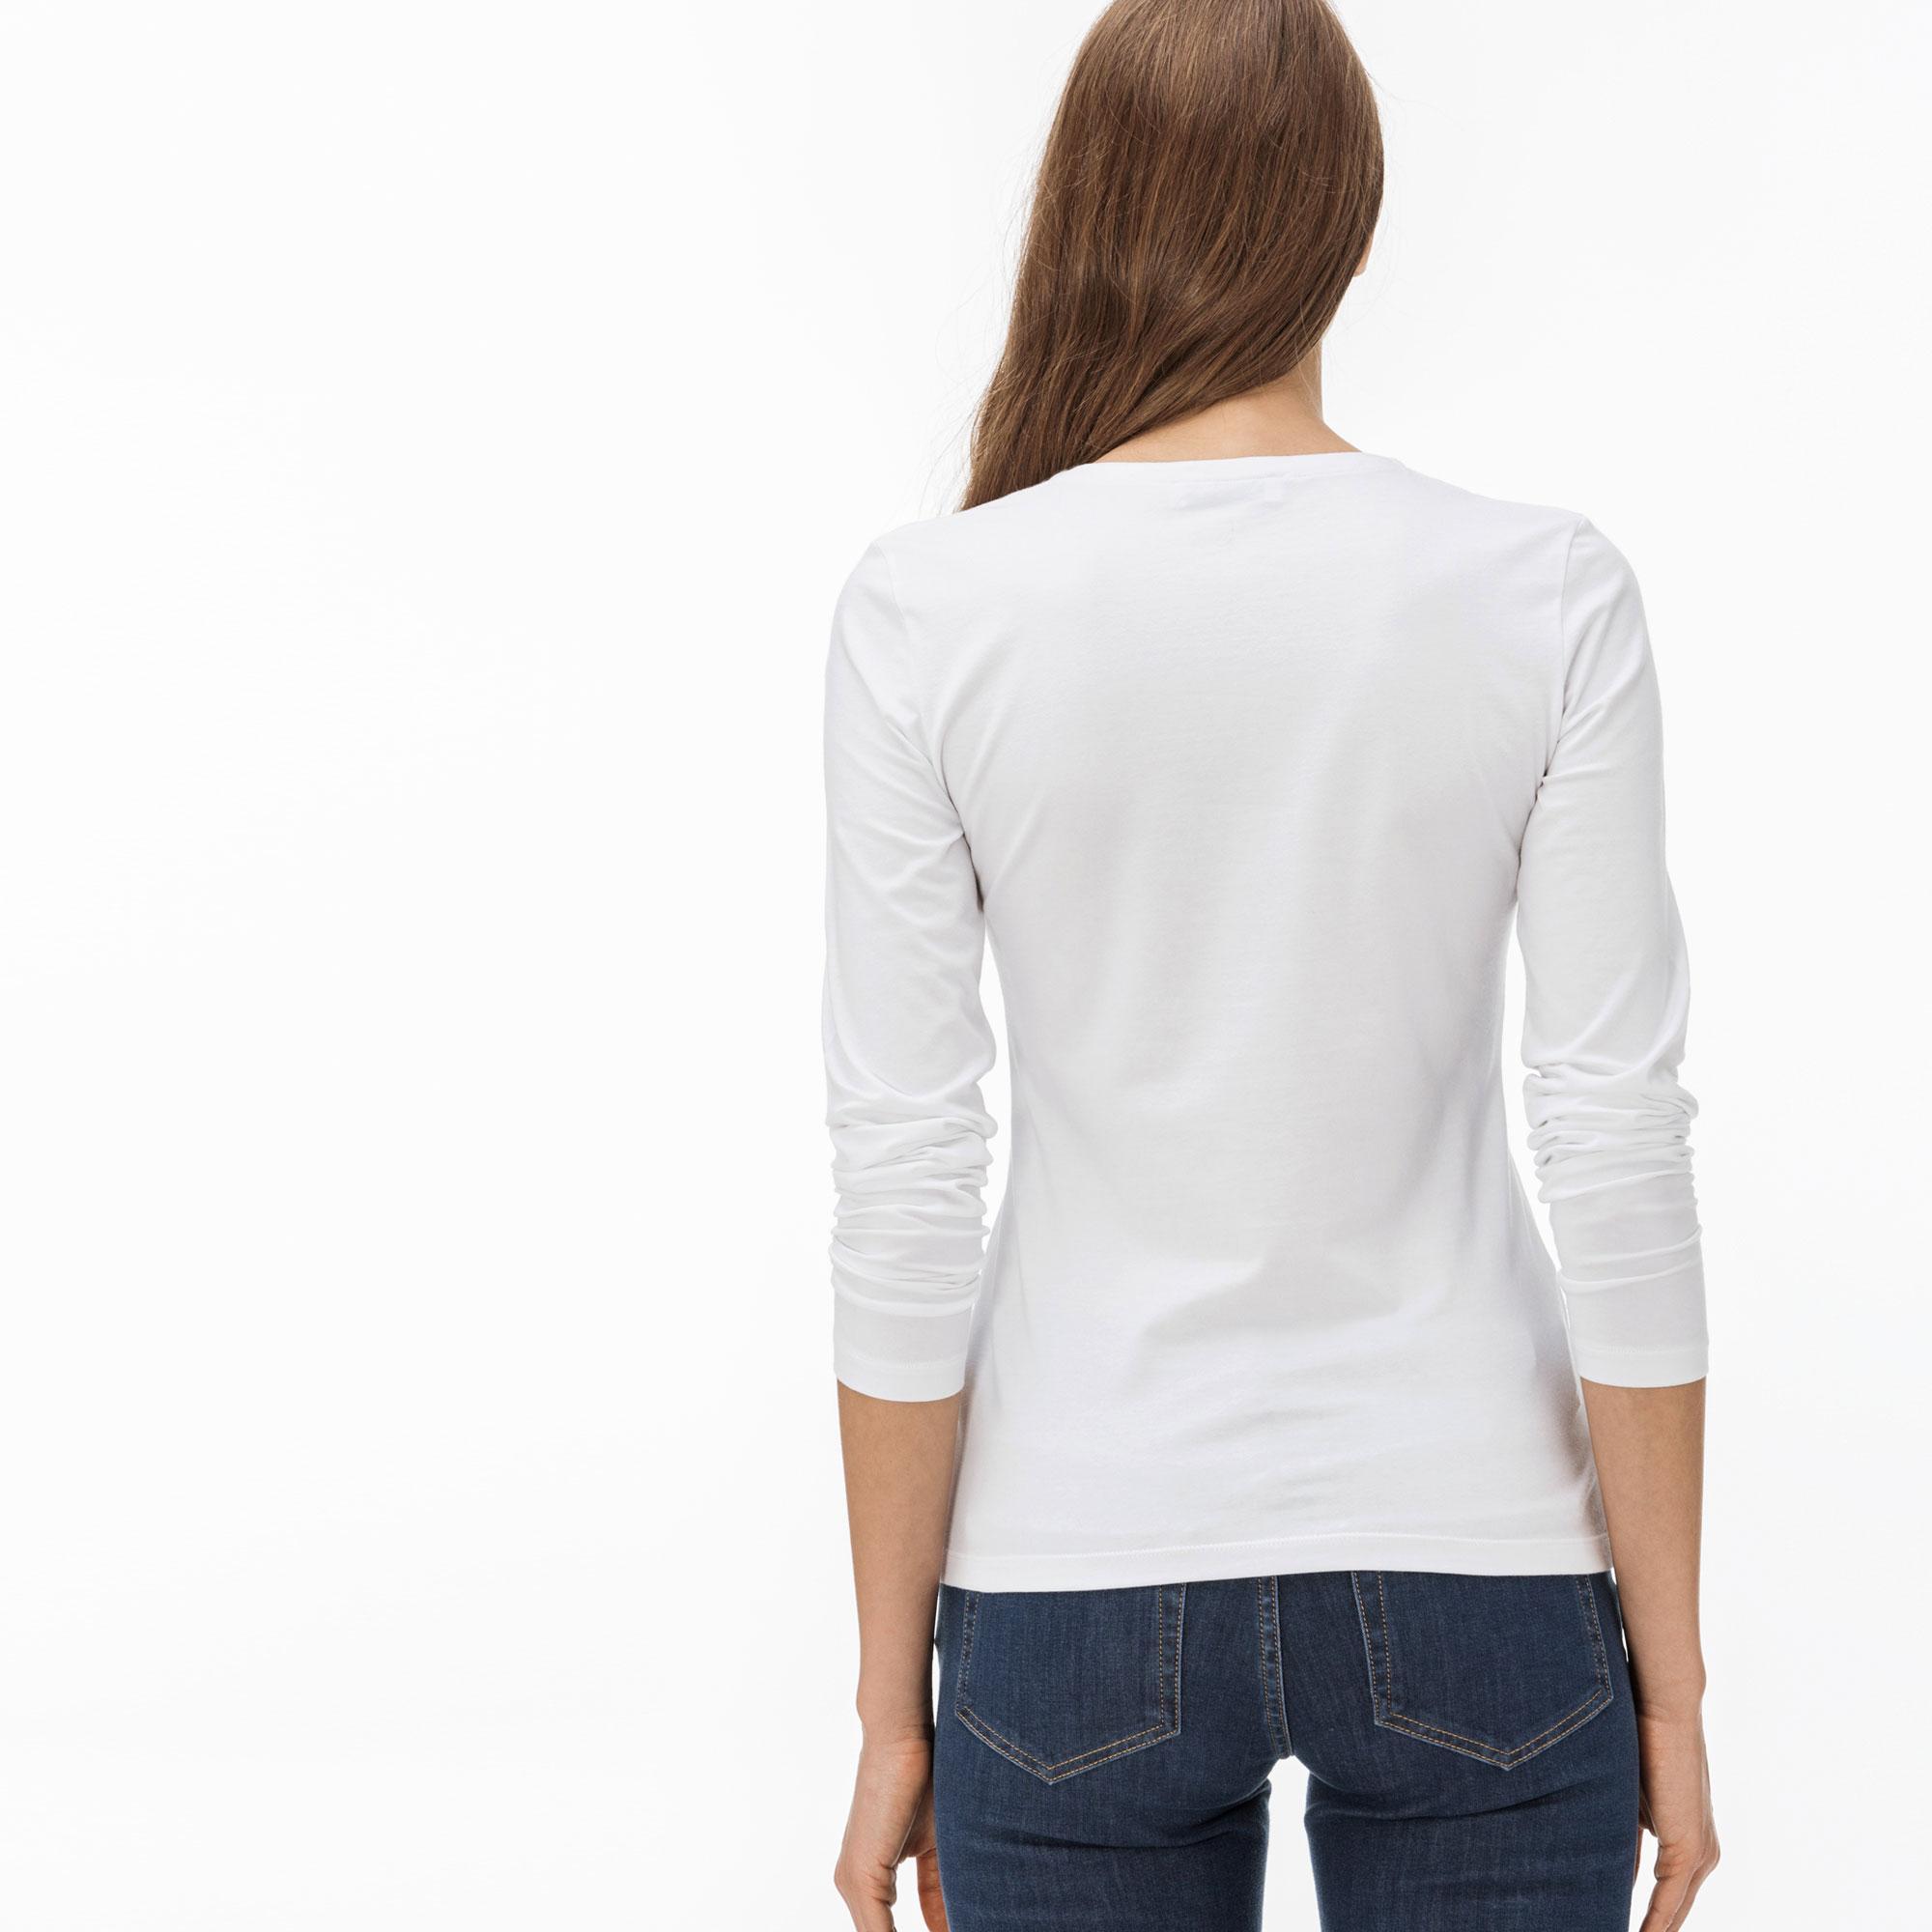 Lacoste Women's V-Neck Flowing Cotton Jersey T-Shirt